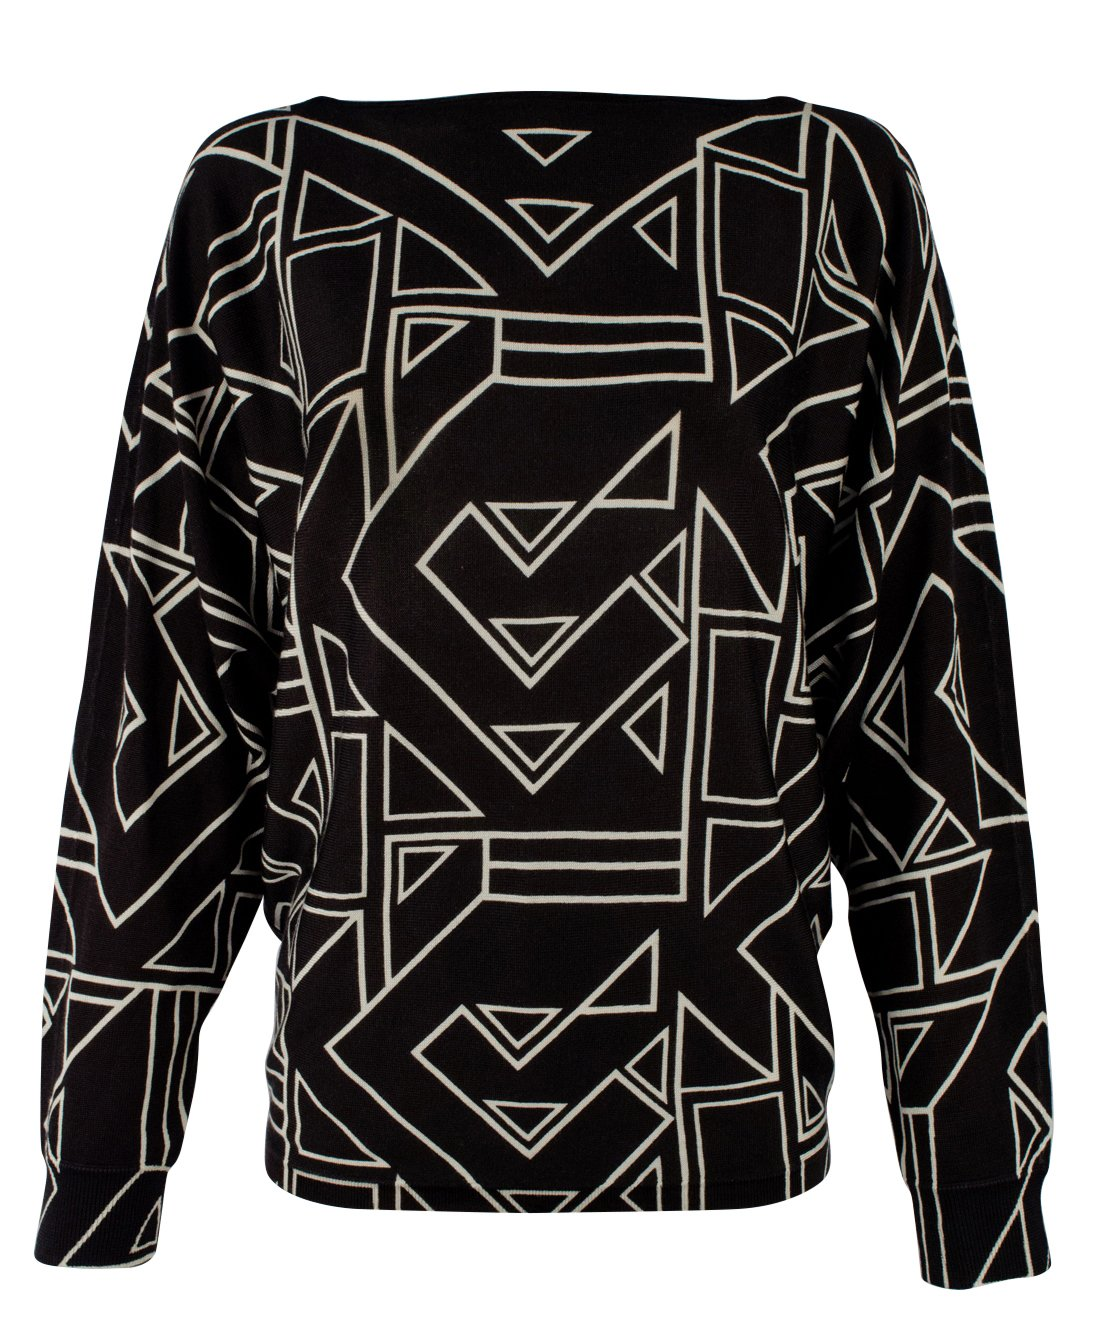 Lauren Ralph Lauren Women's Plus Size Geometric Print Sweater-BM-1X